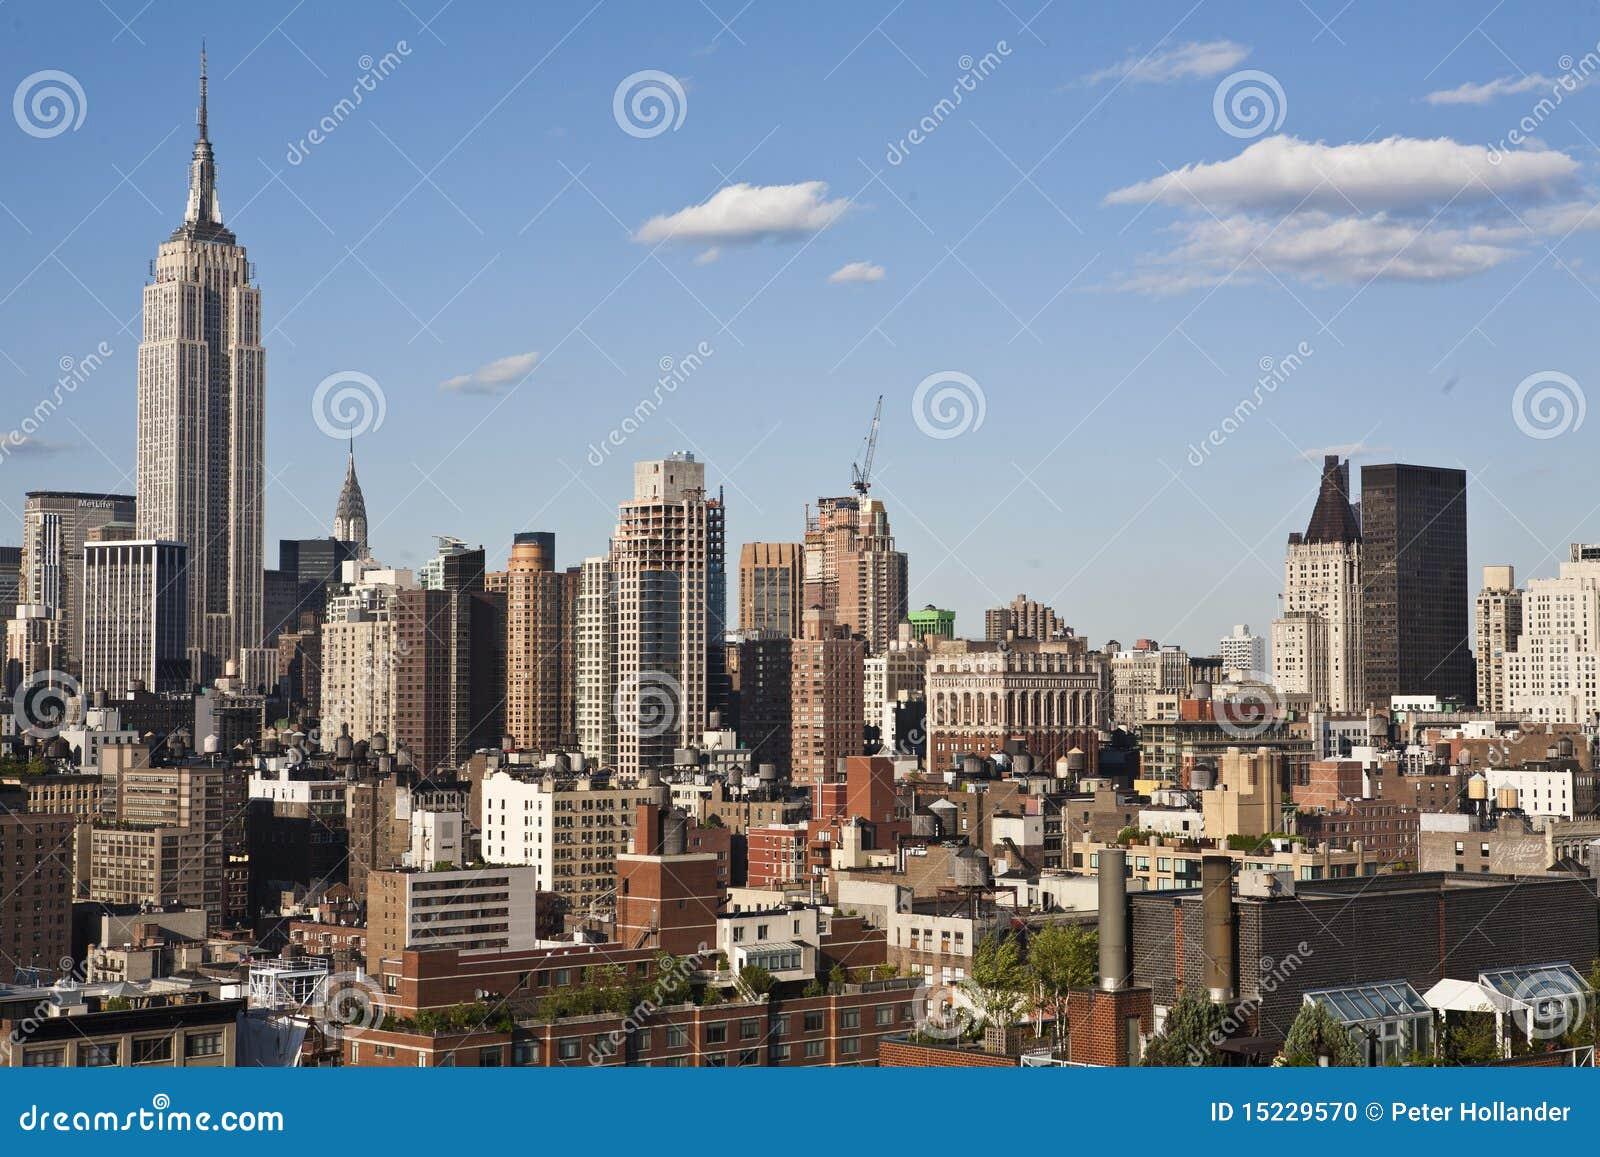 york city skyline day - photo #14